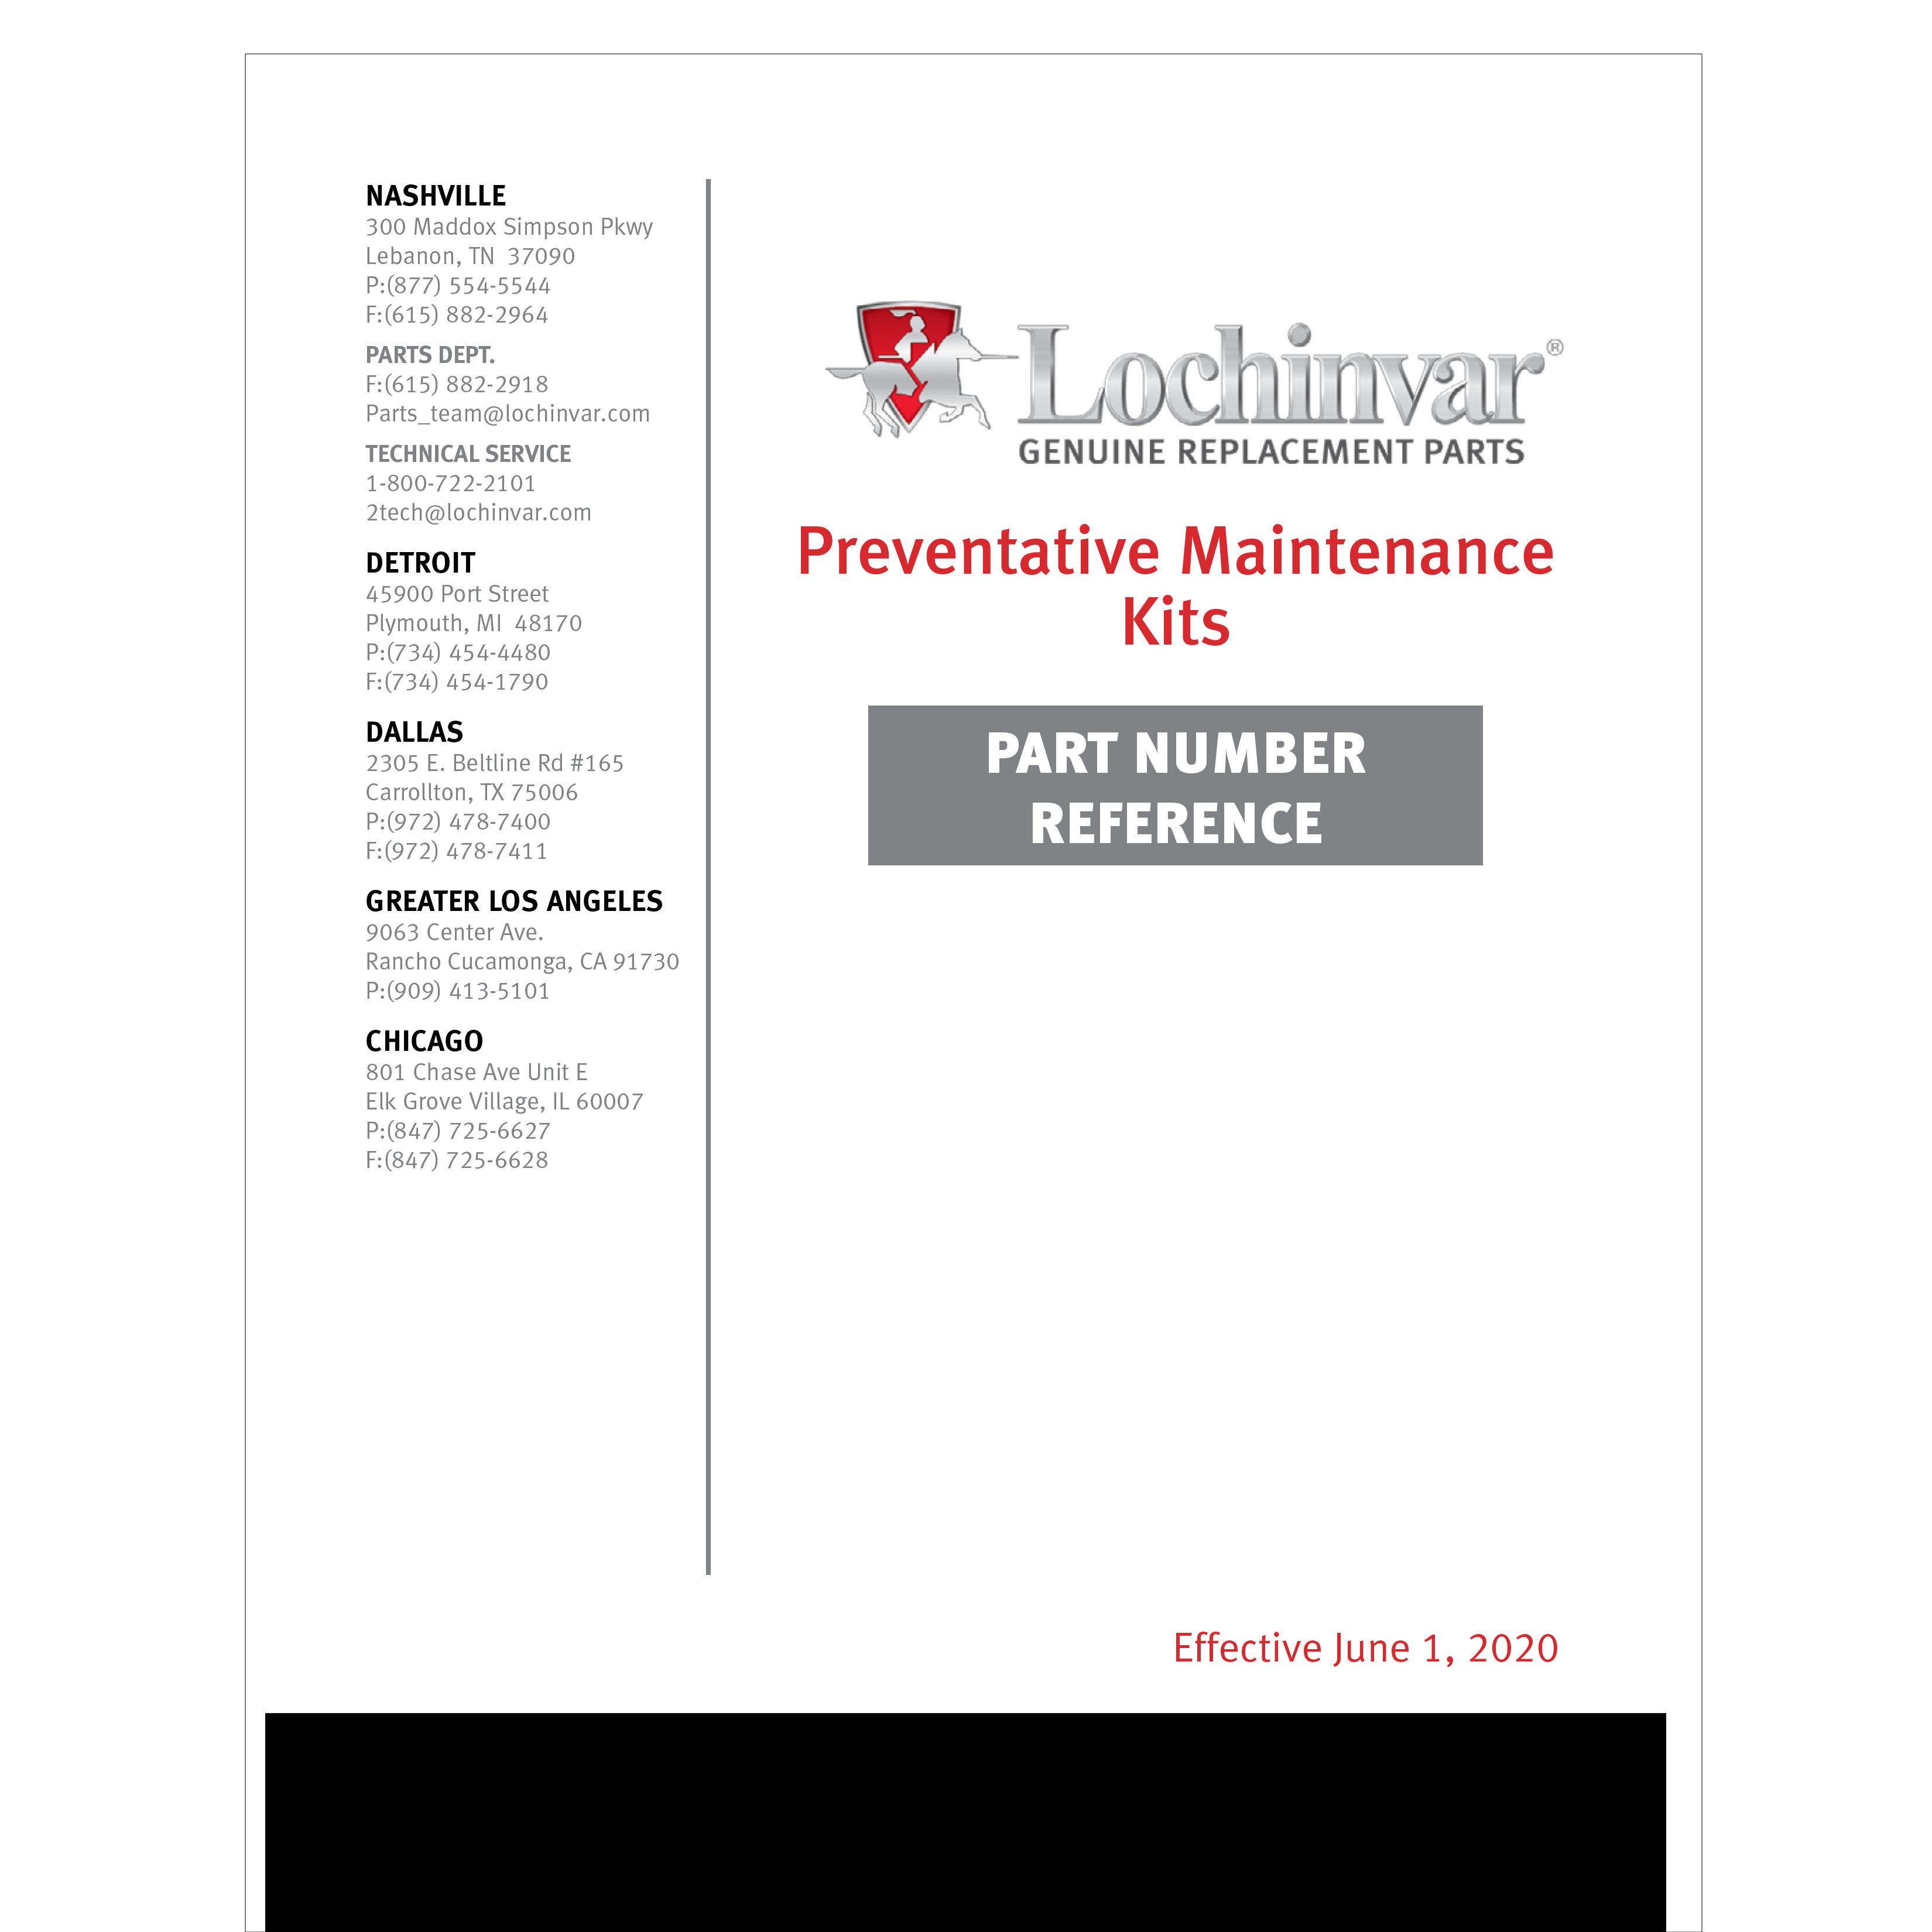 Preventative Maintenance Kit Part Number Reference